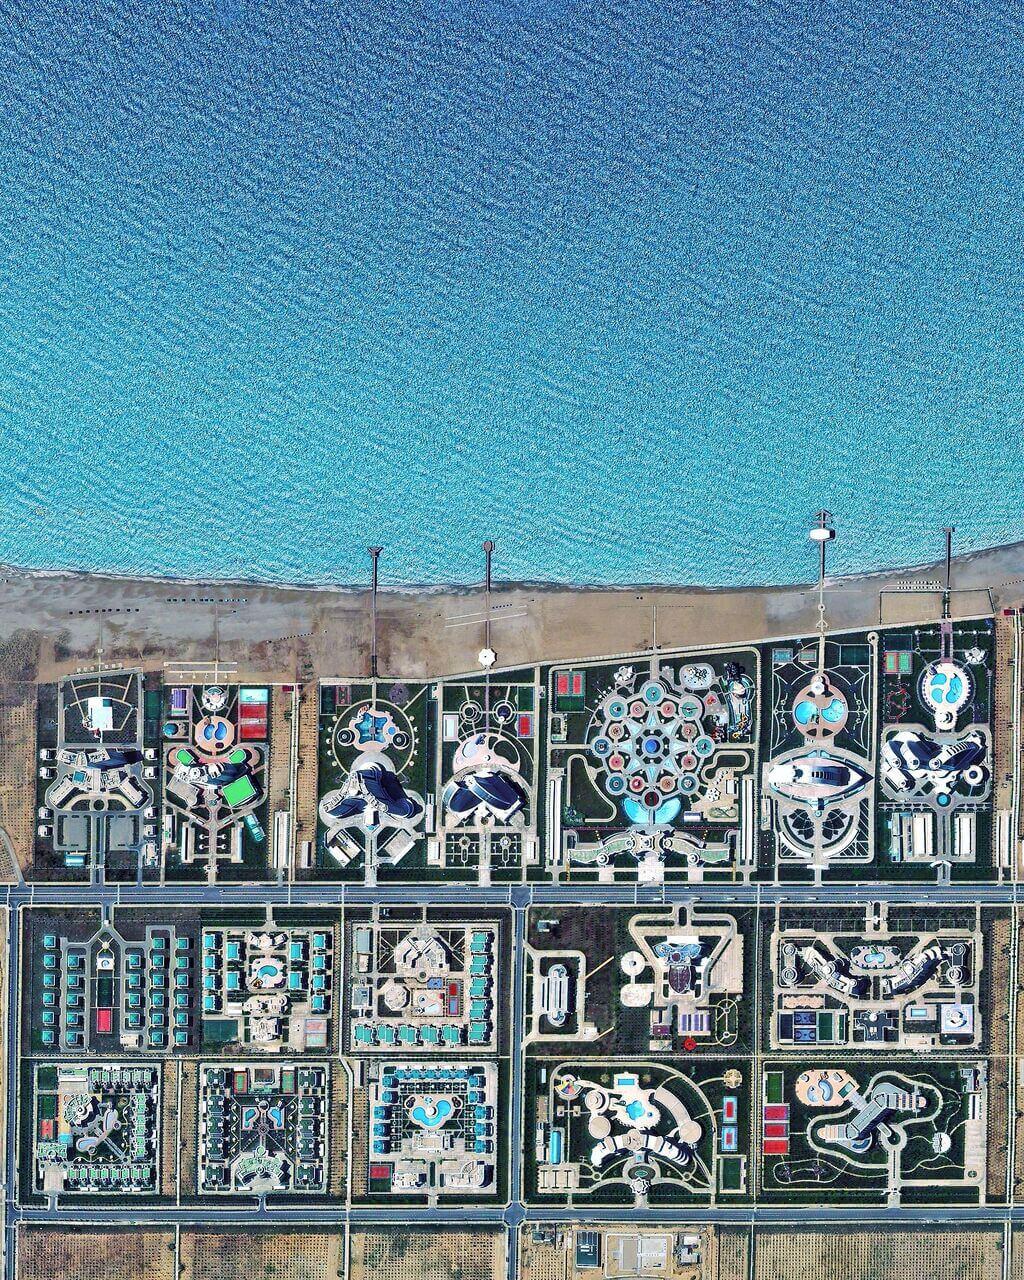 Types of Urban Blocks